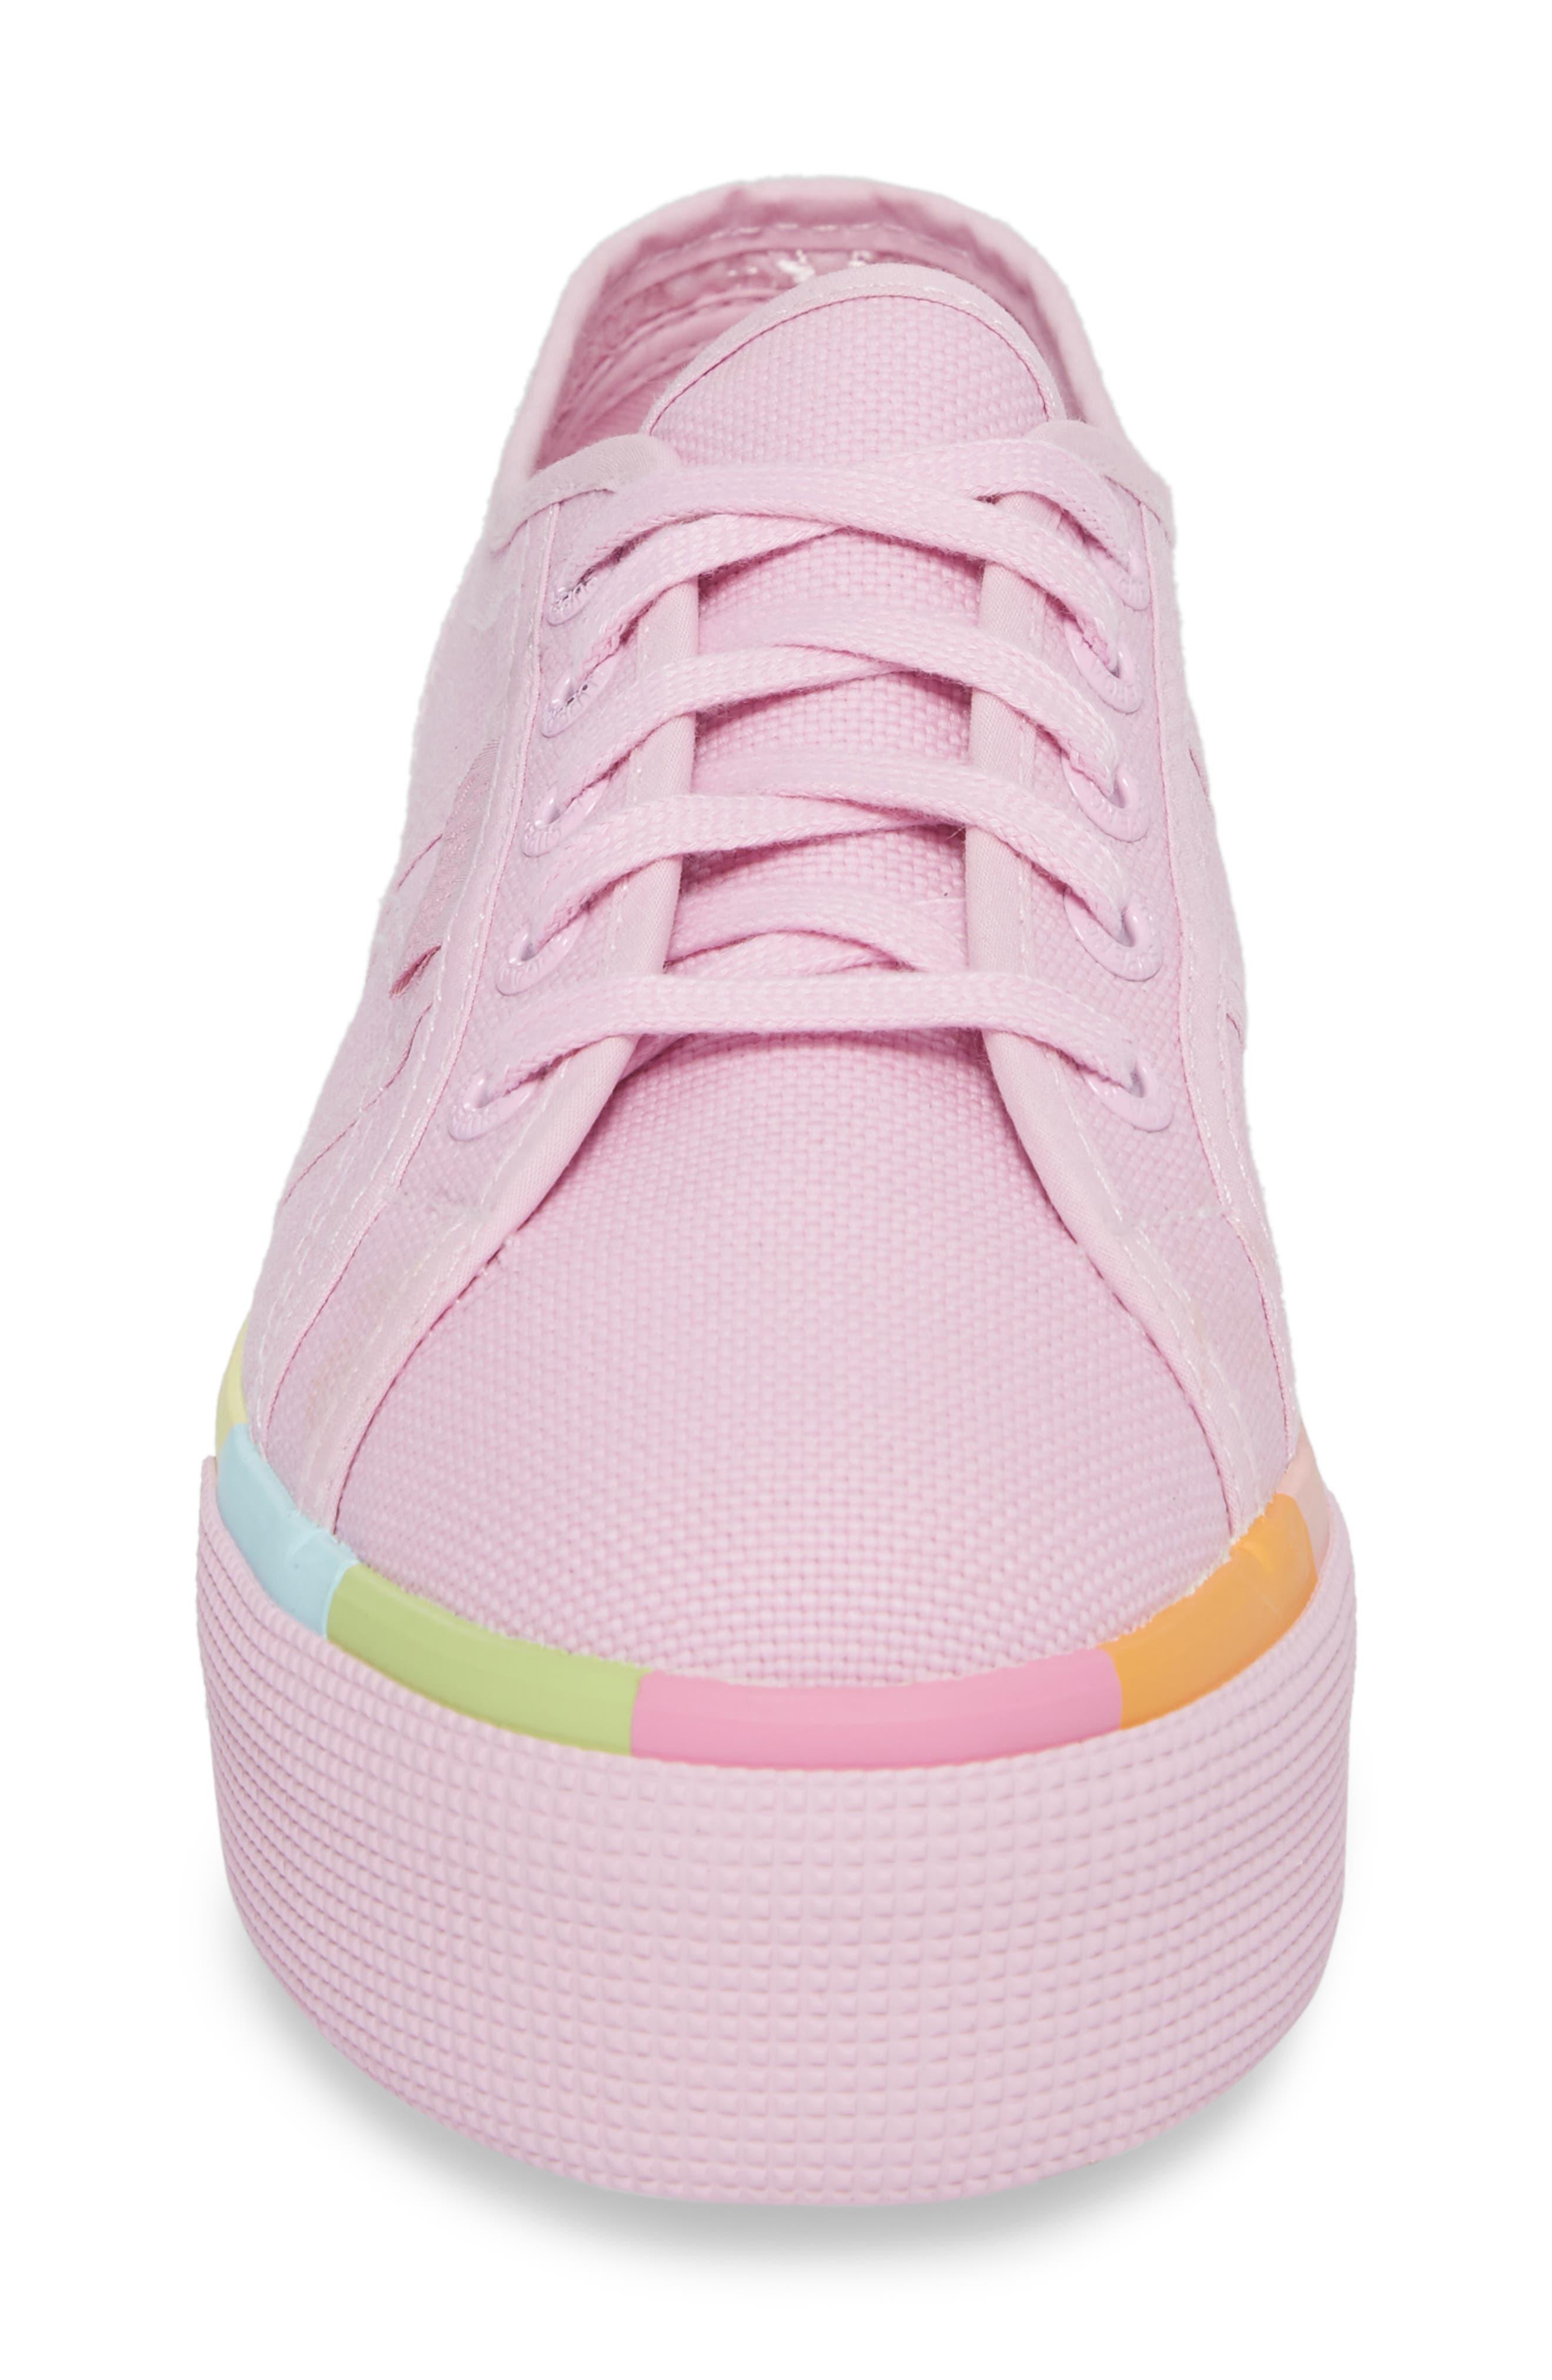 2790 Platform Sneaker,                             Alternate thumbnail 4, color,                             Pink